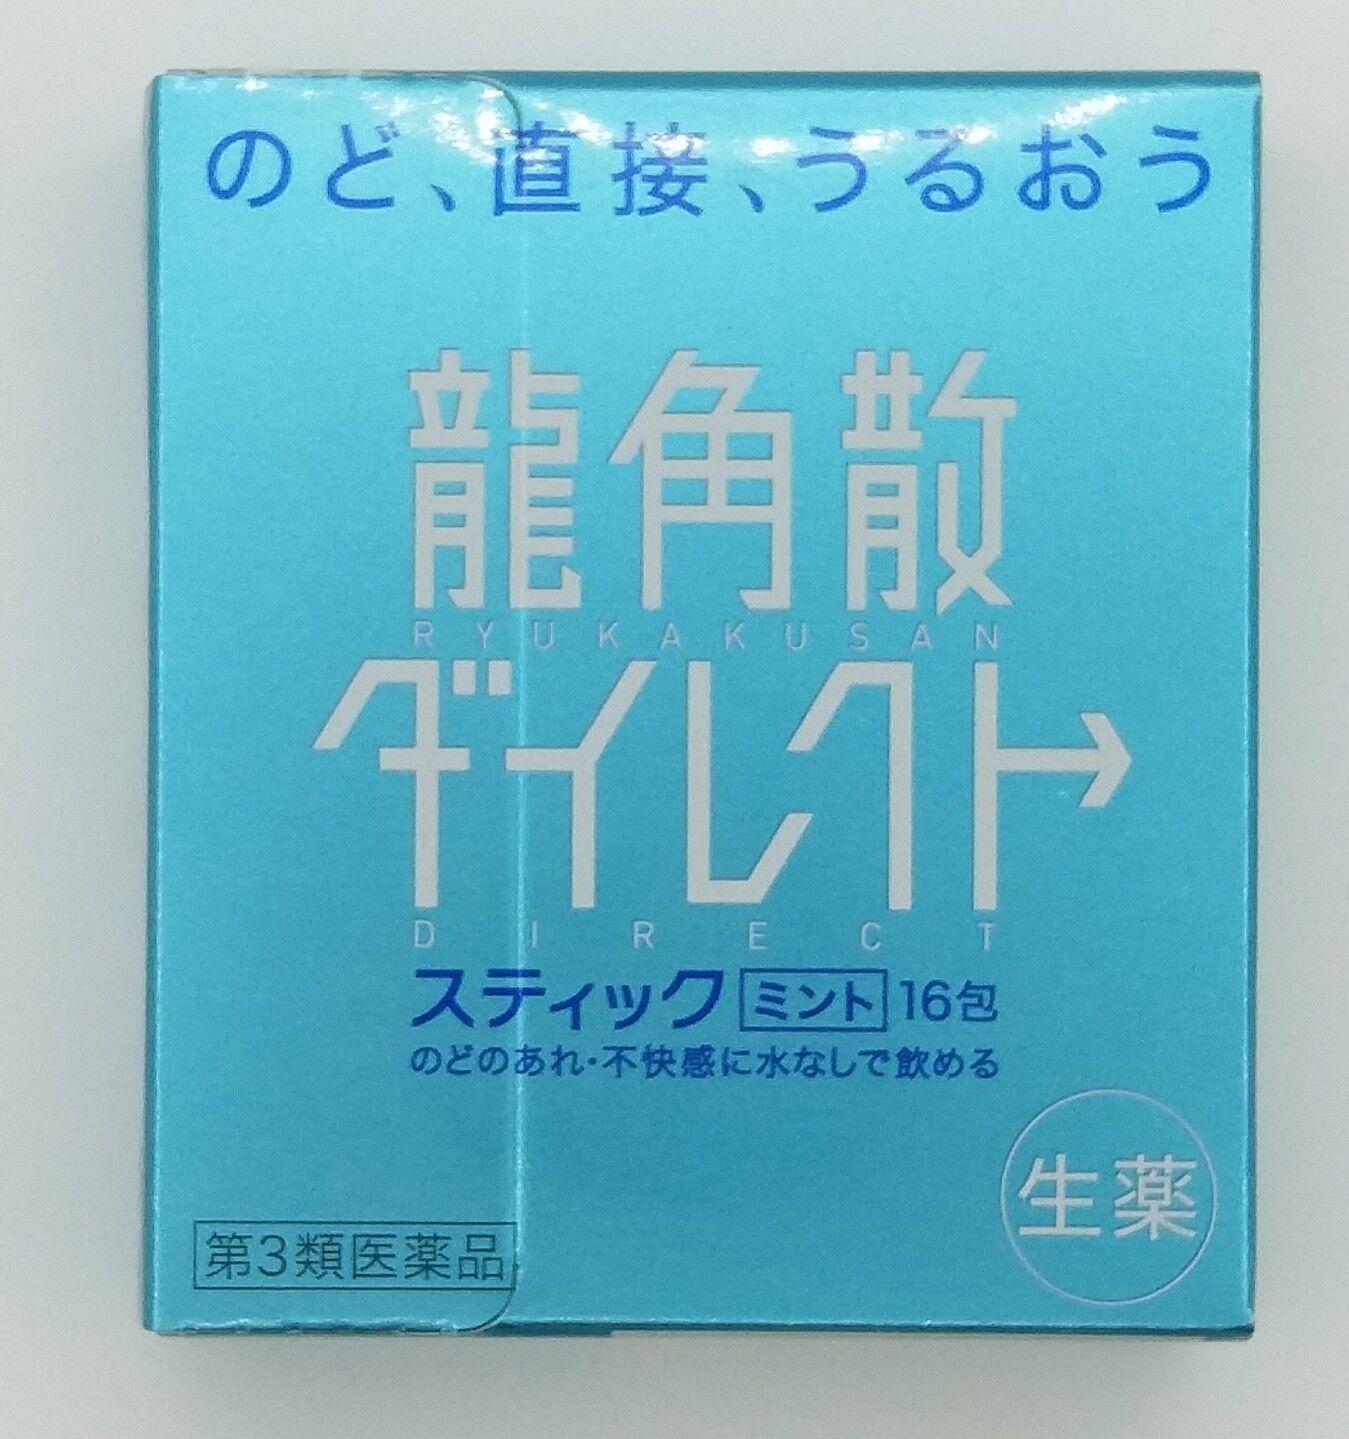 Ryikakusan Direct Stick Sore Throat Cough Mint Herbal Powder 1 BOX =16PCS (C)